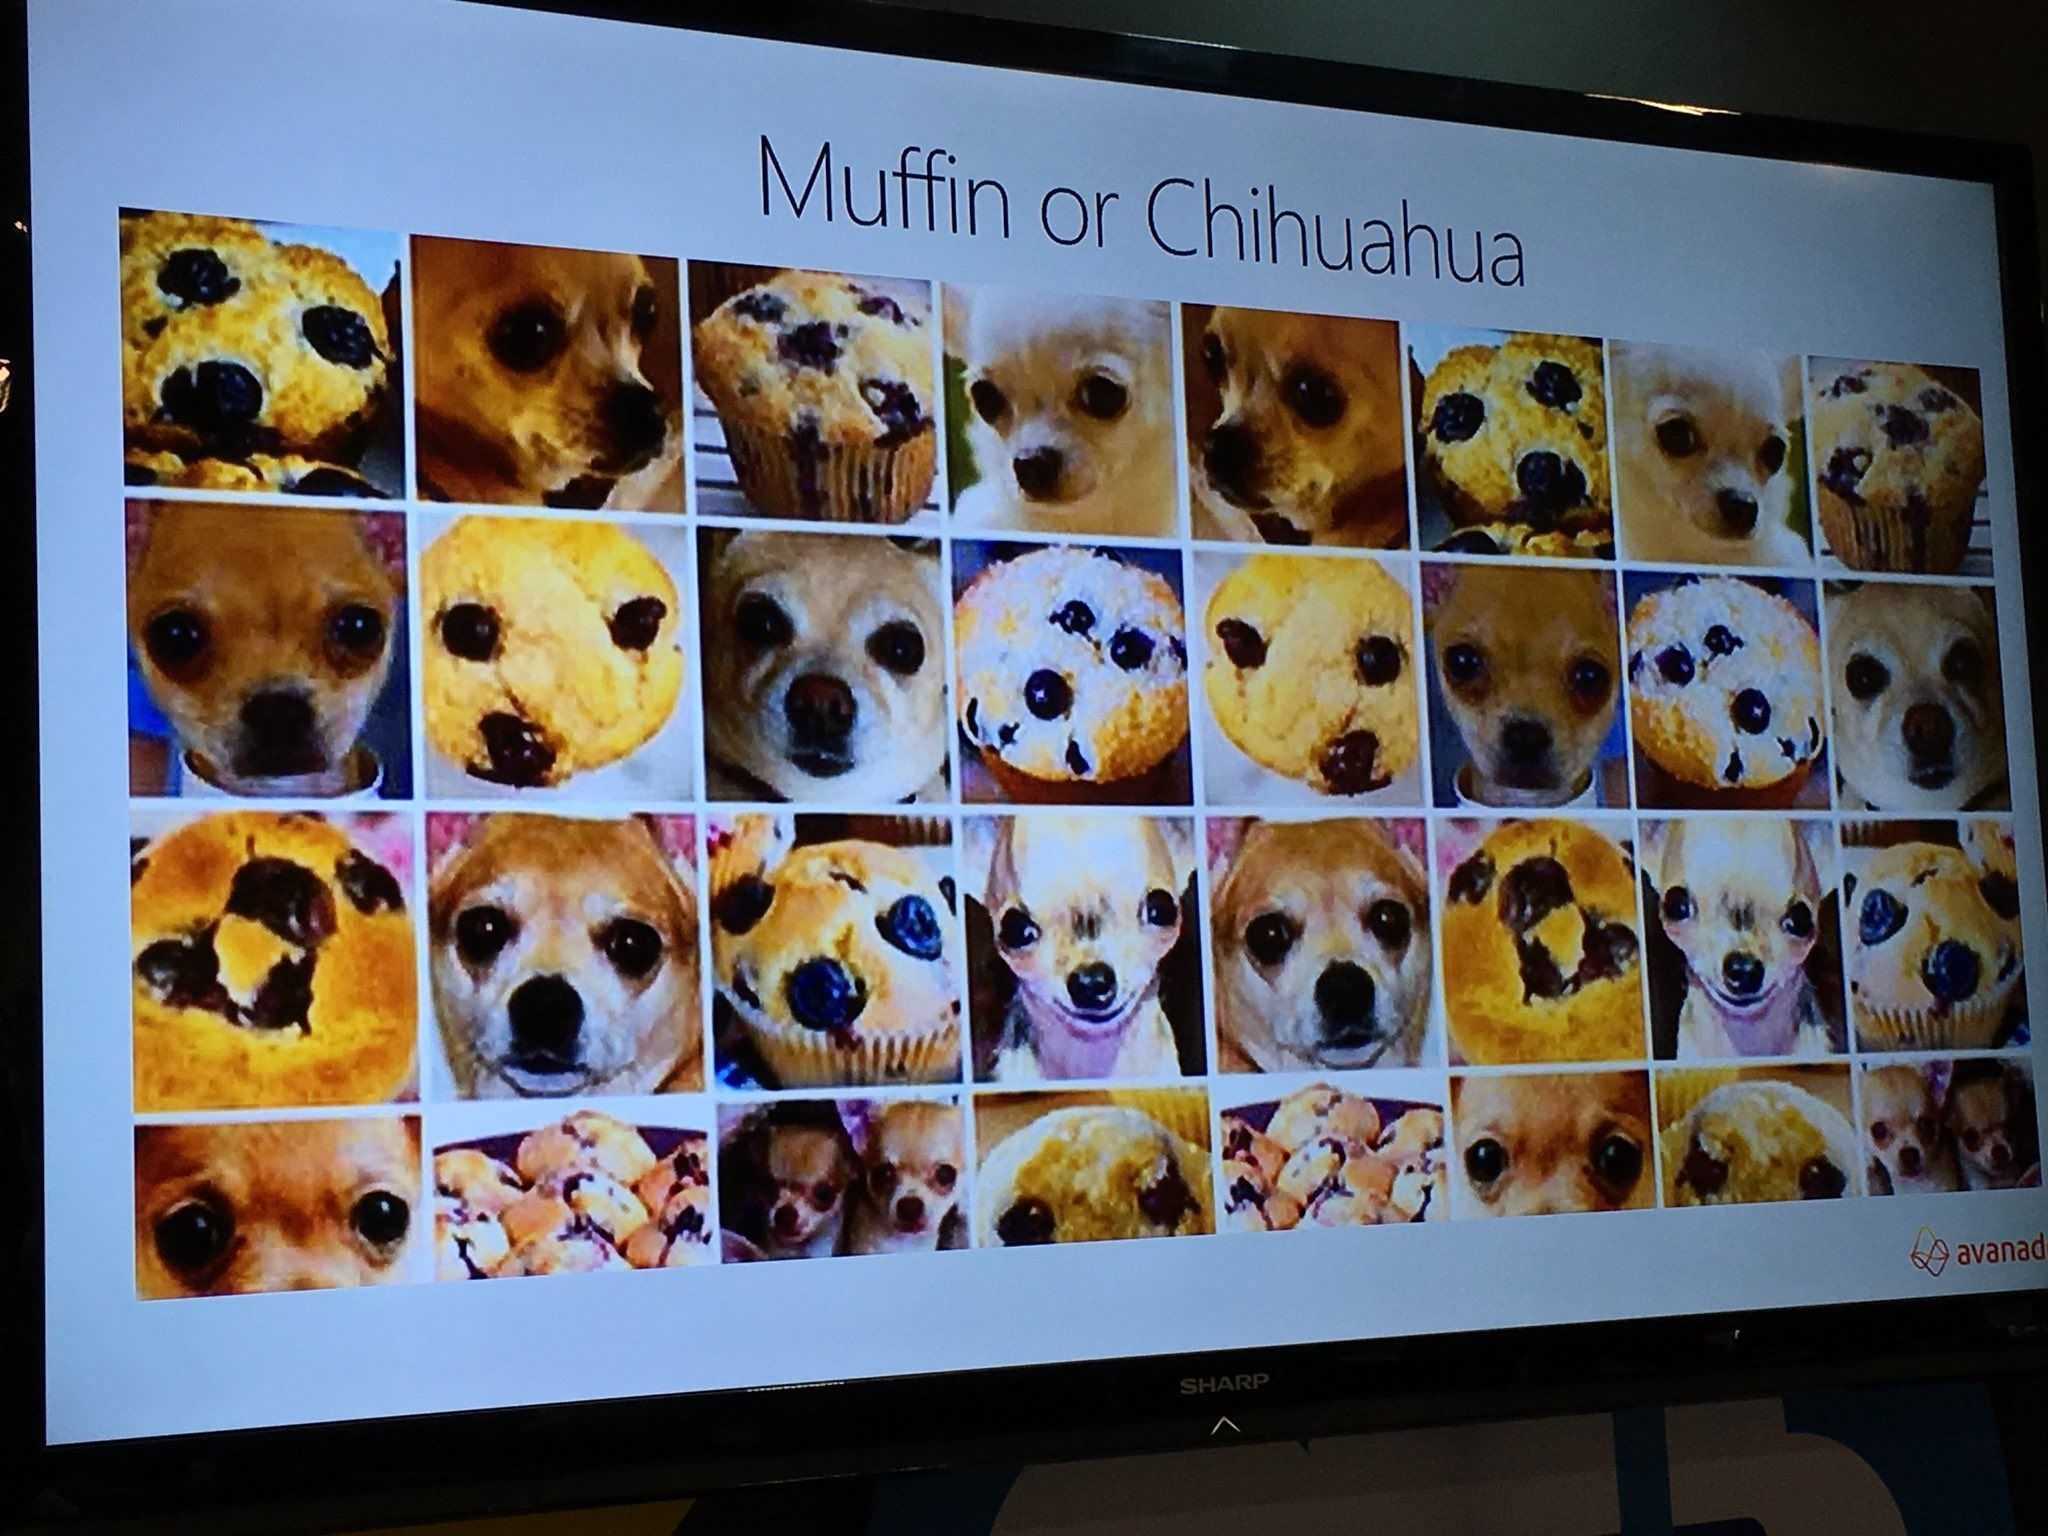 Muffin or Chihuahua? http//ift.tt/2j53em0 Chihuahua